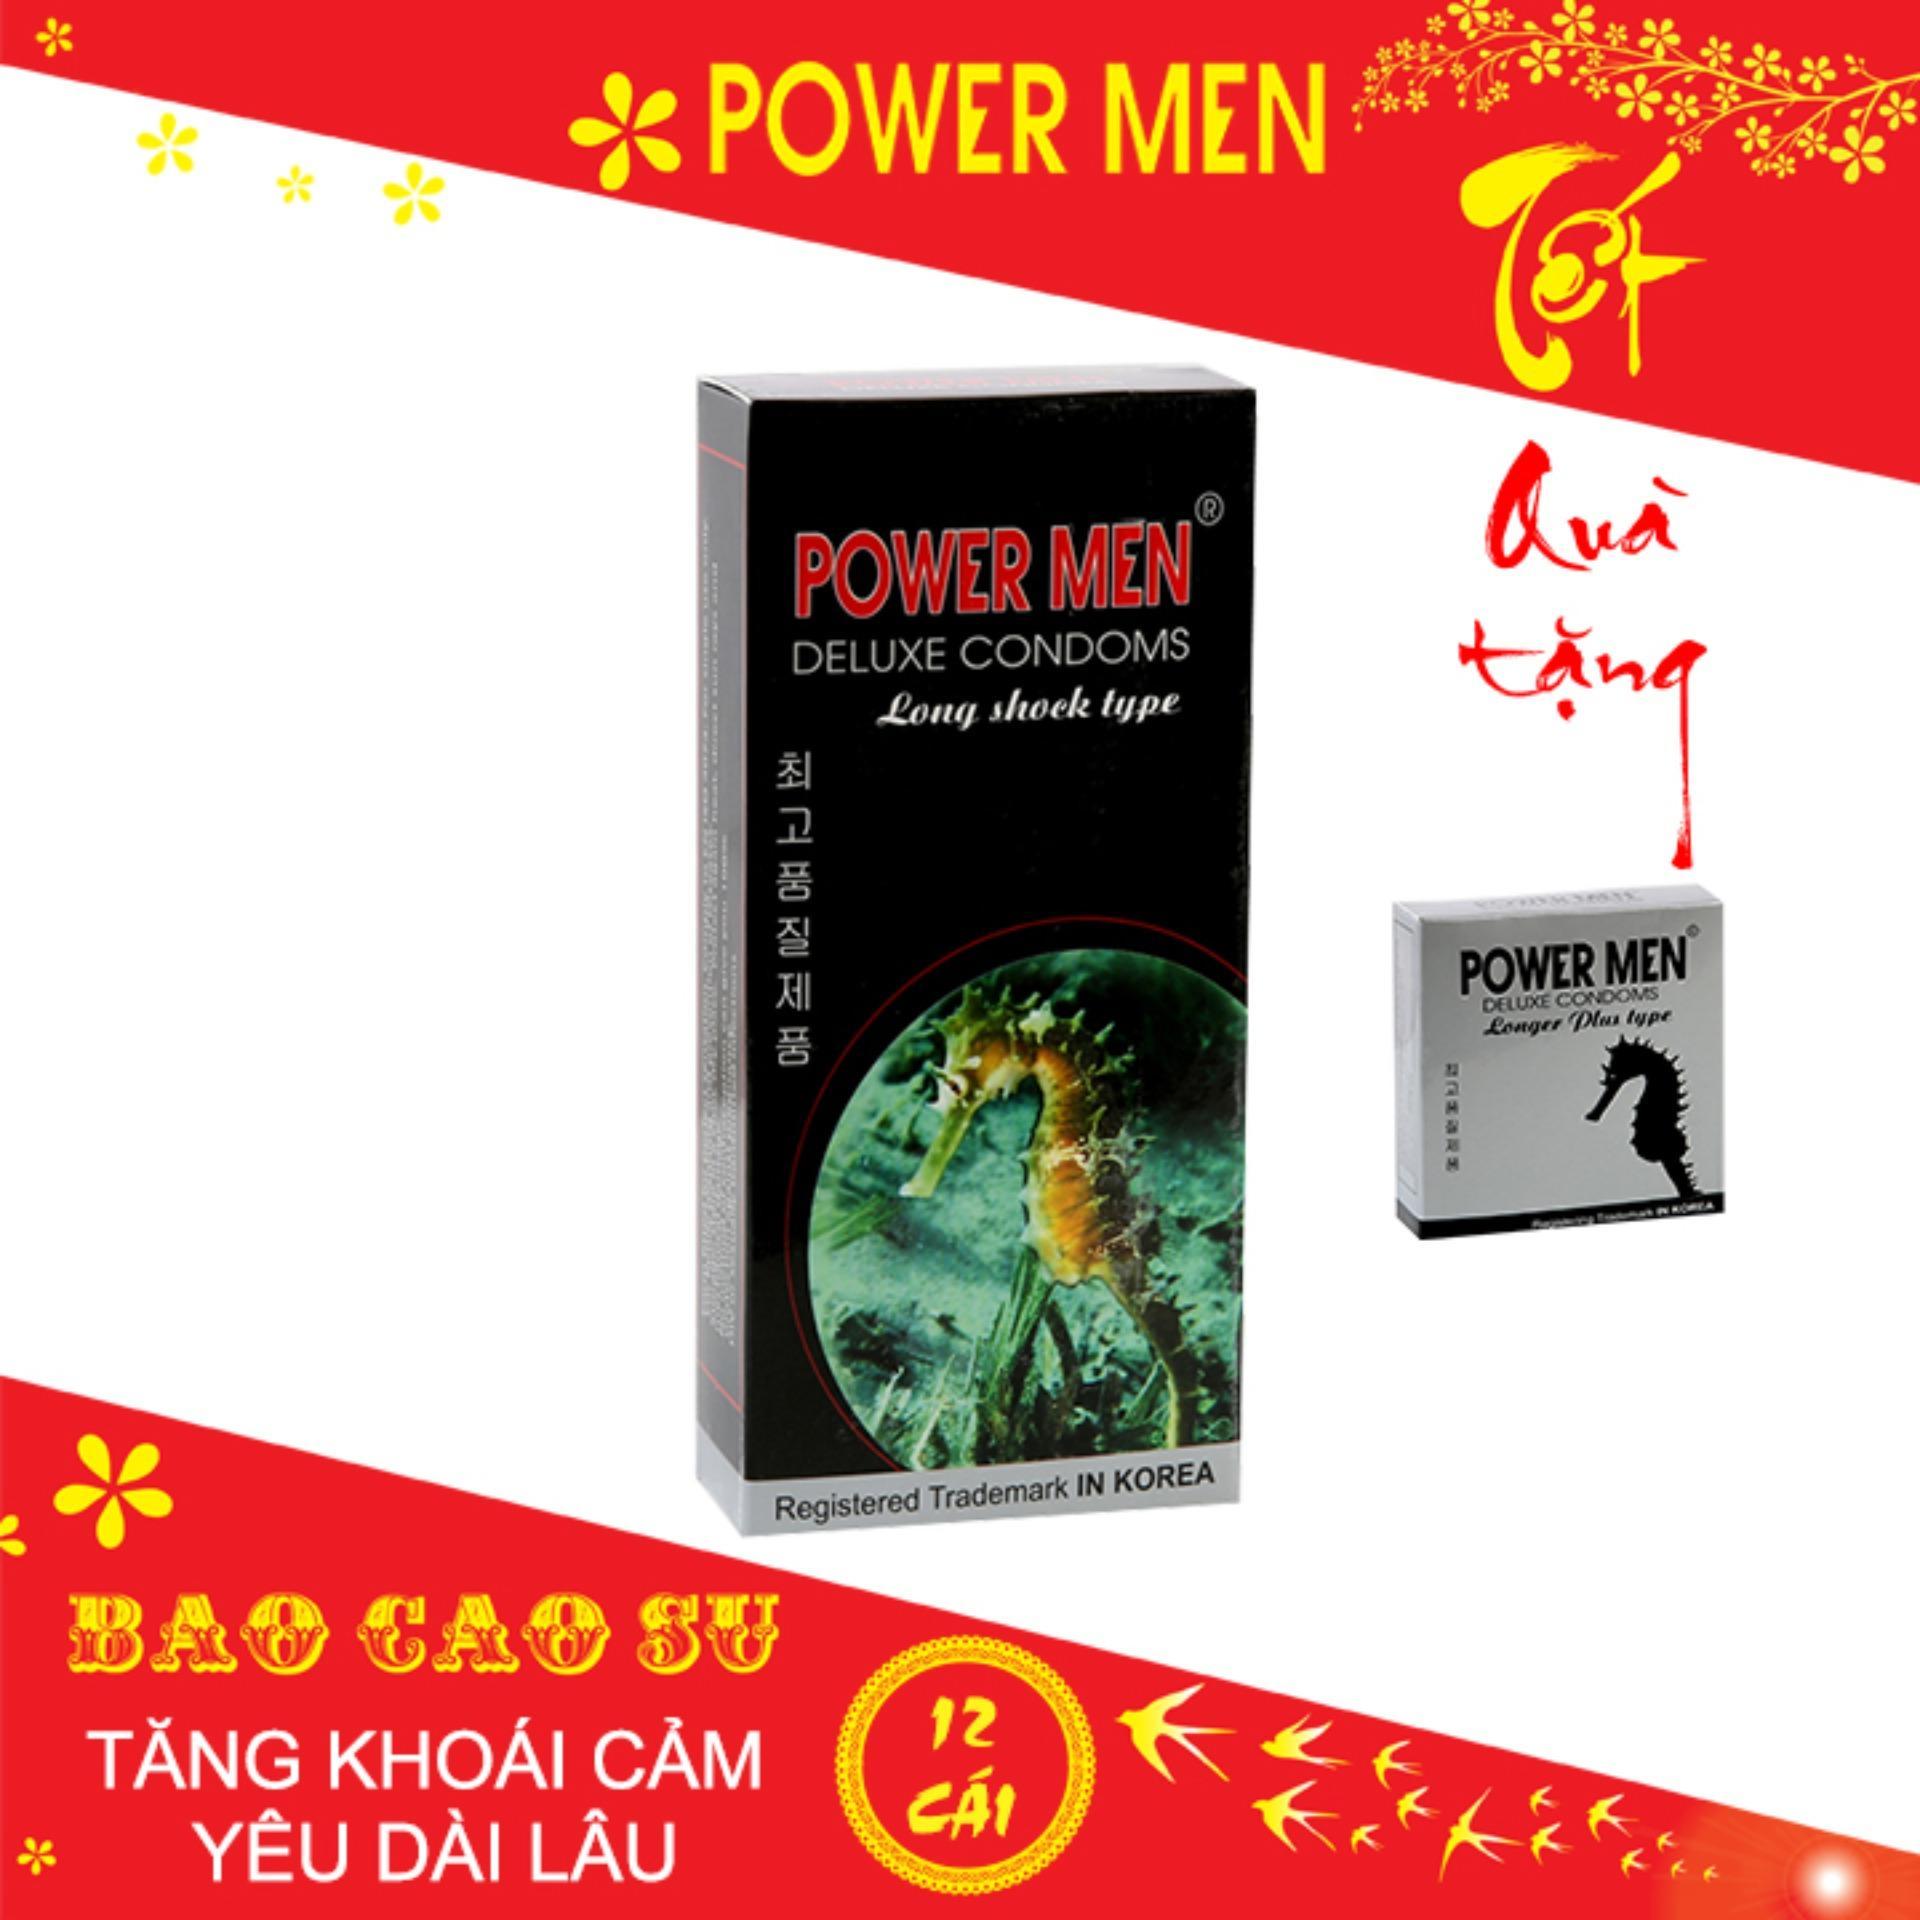 [Mua 1 Tặng 1] Bao cao su Powermen Longshock Hộp 12 Chiếc nhập khẩu